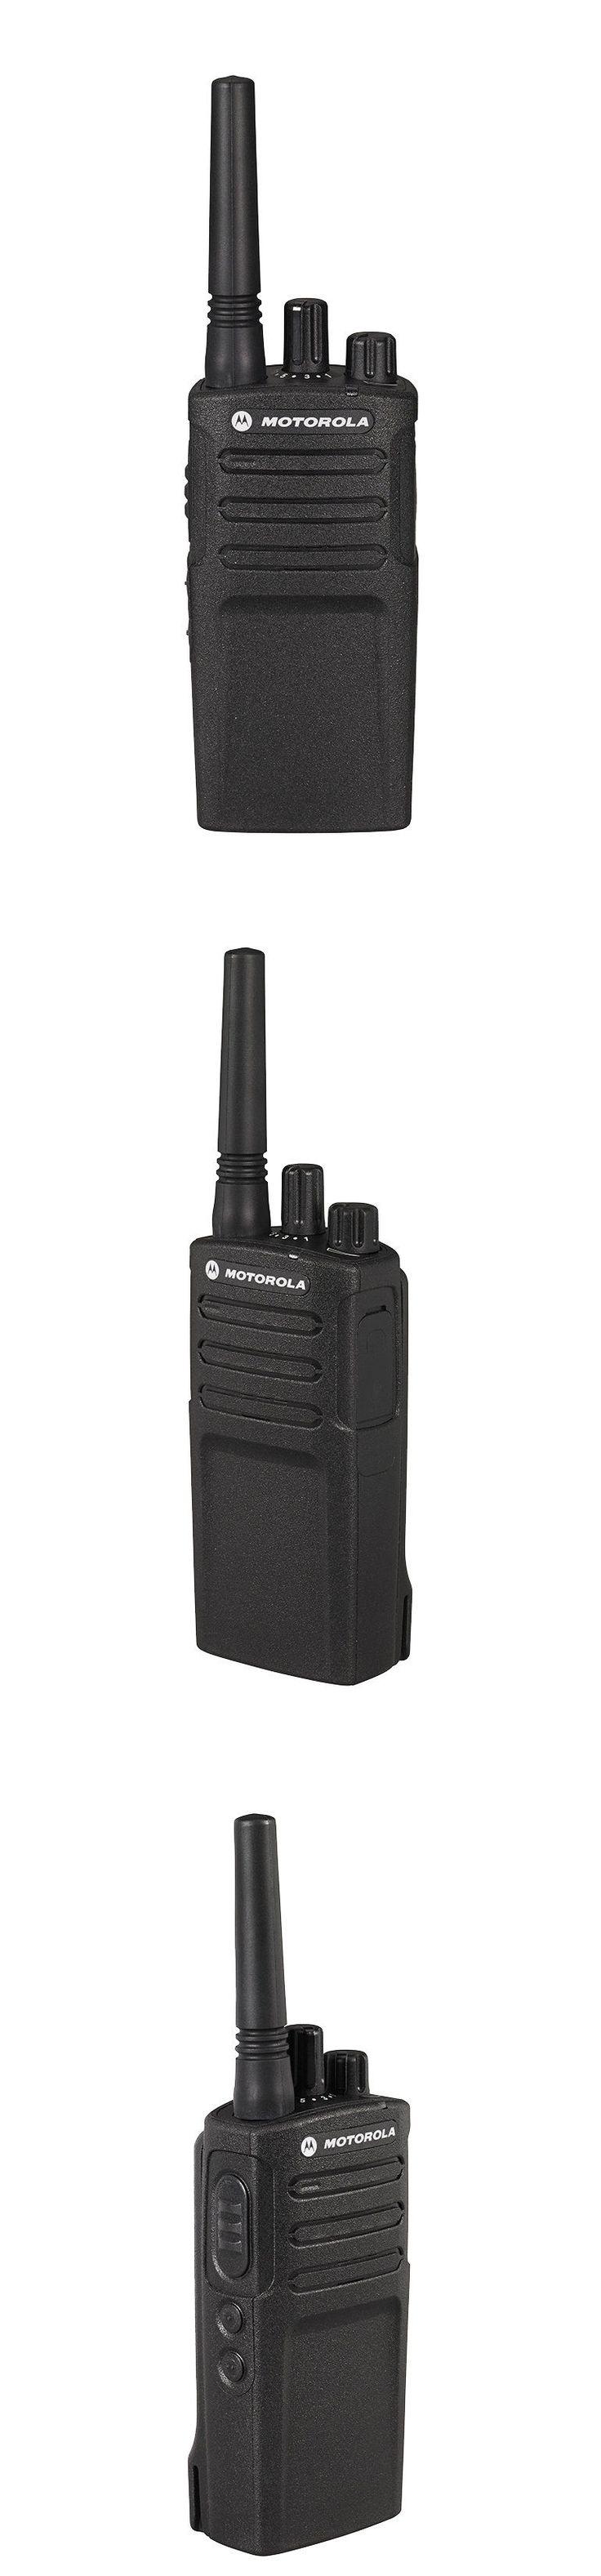 Walkie Talkie Two-Way Antennas: **New** Motorola Rmm2050 - Vhf 2 Watt/5 Channel Murs Radio - License Free BUY IT NOW ONLY: $189.0